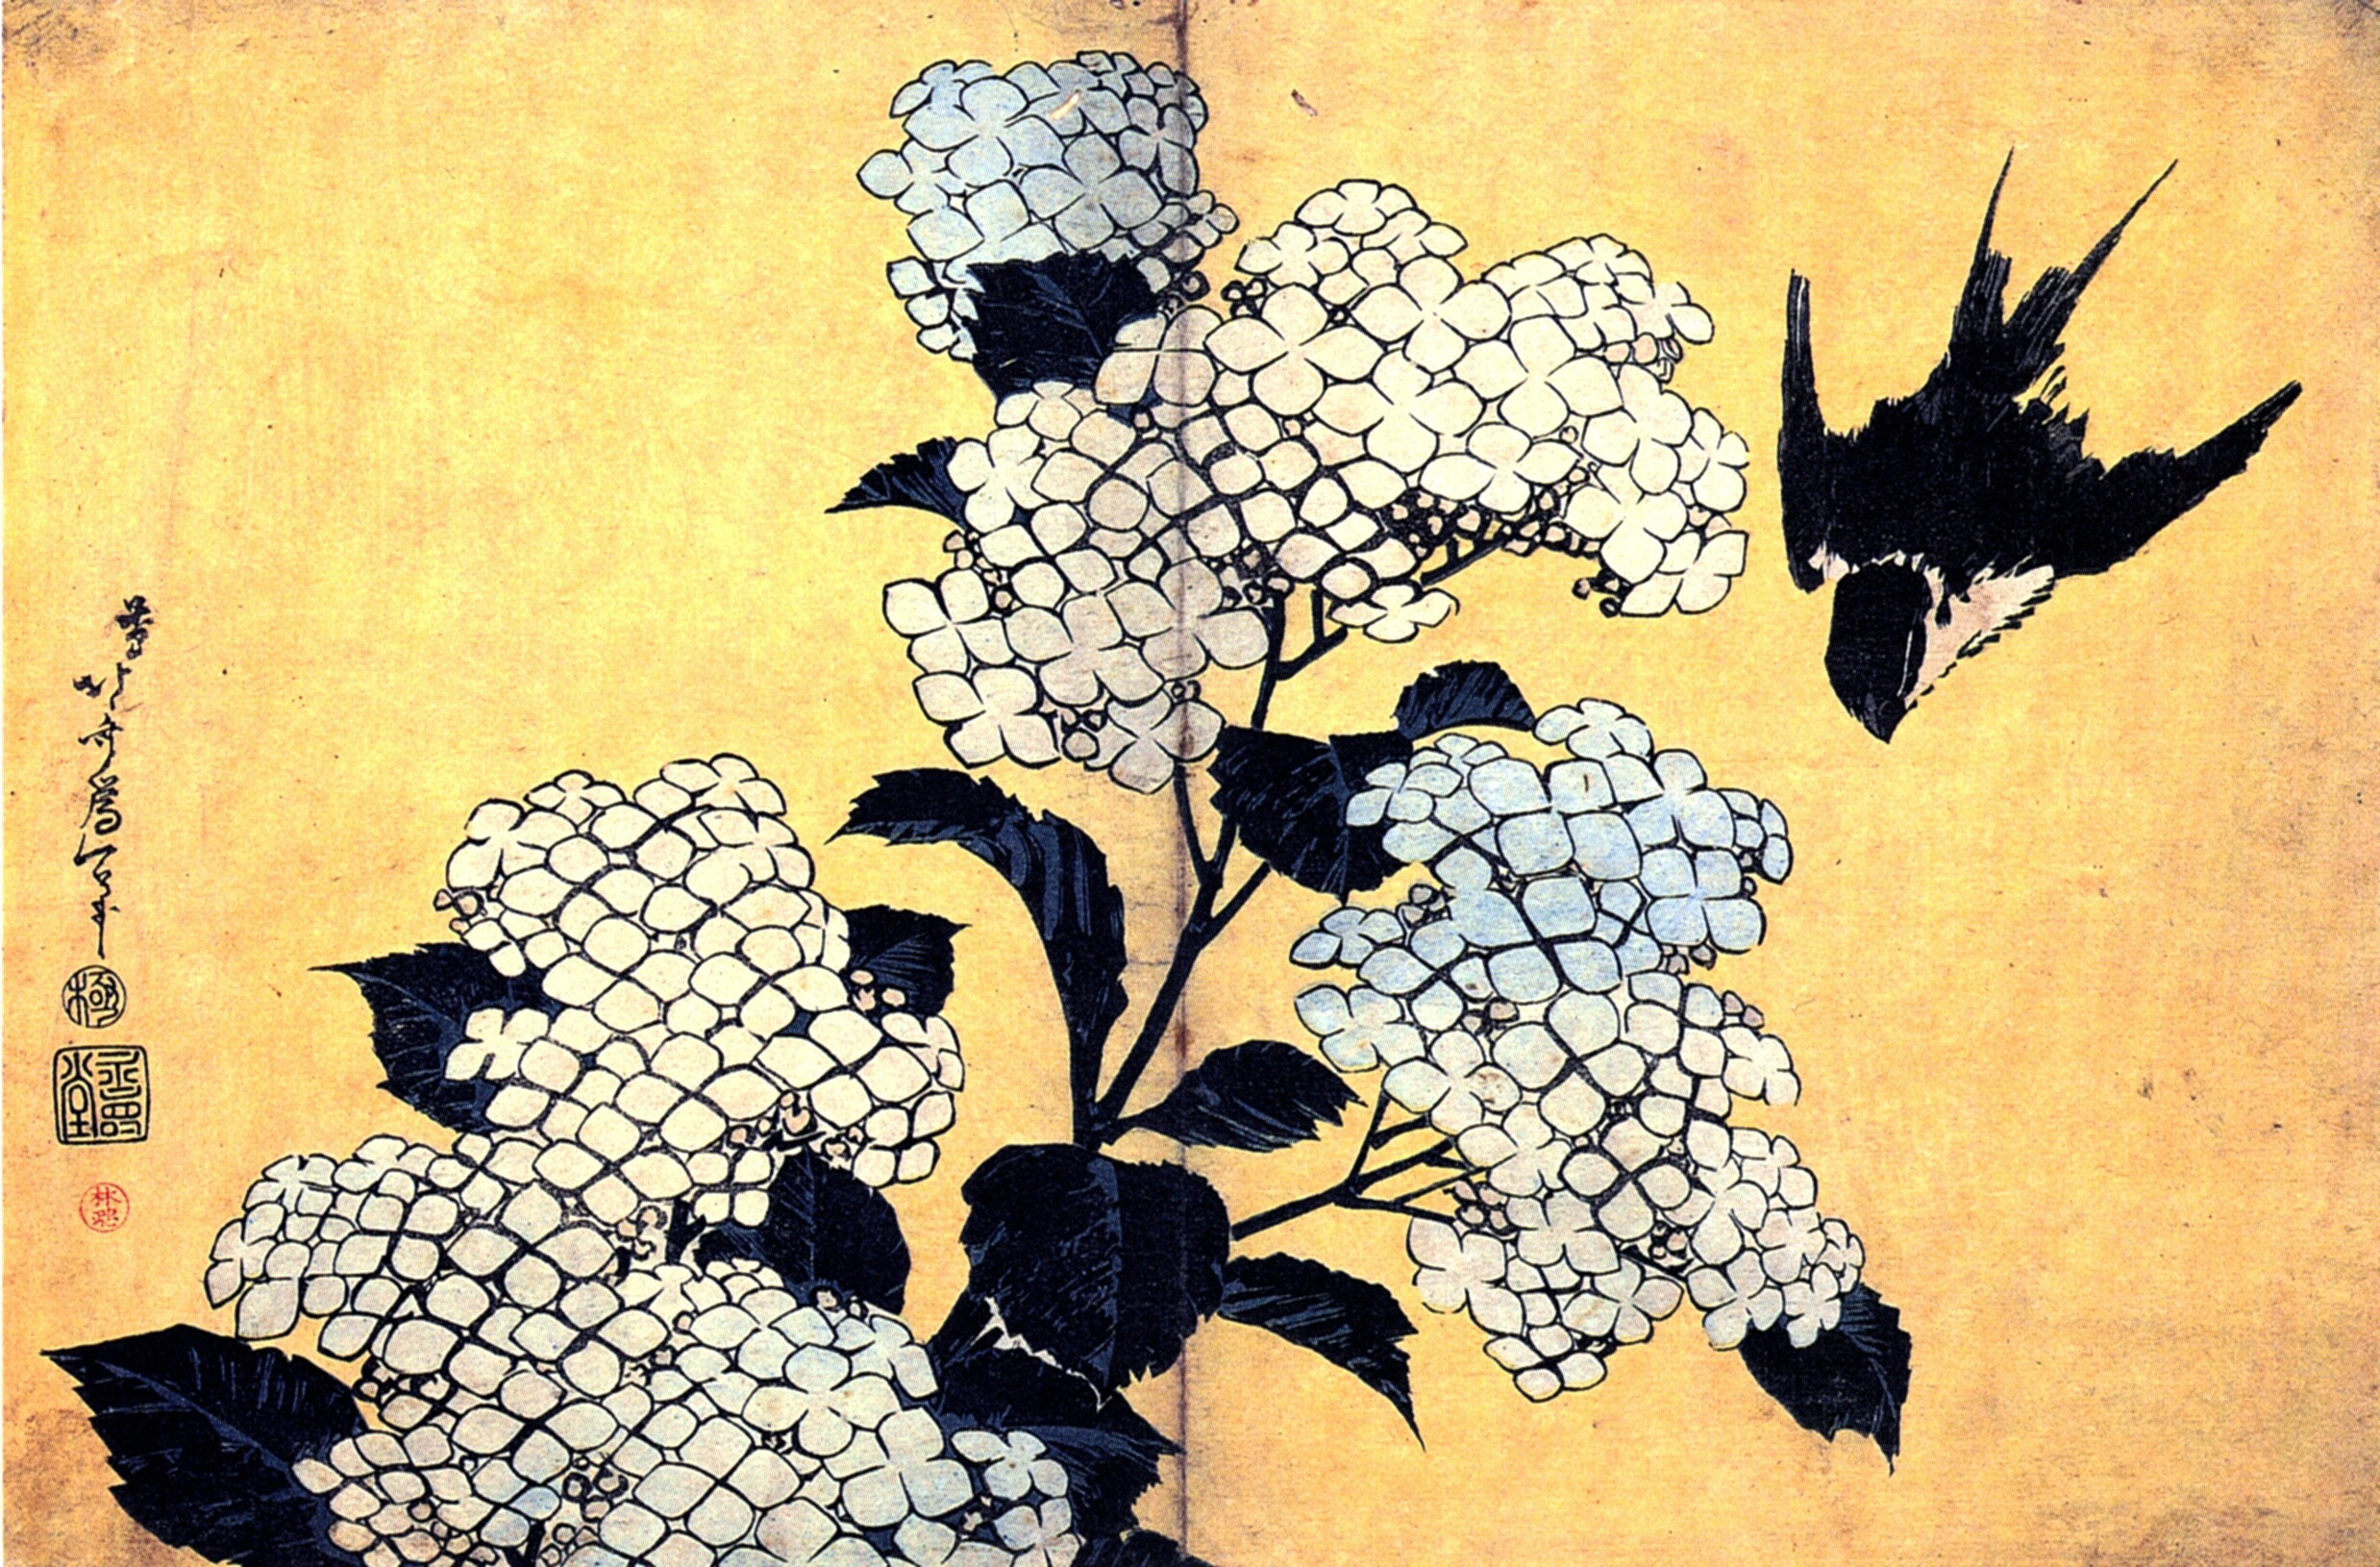 Hydrangea and Swallow, Katsushika Hokusai, n.d., Guimet Museum, Paris